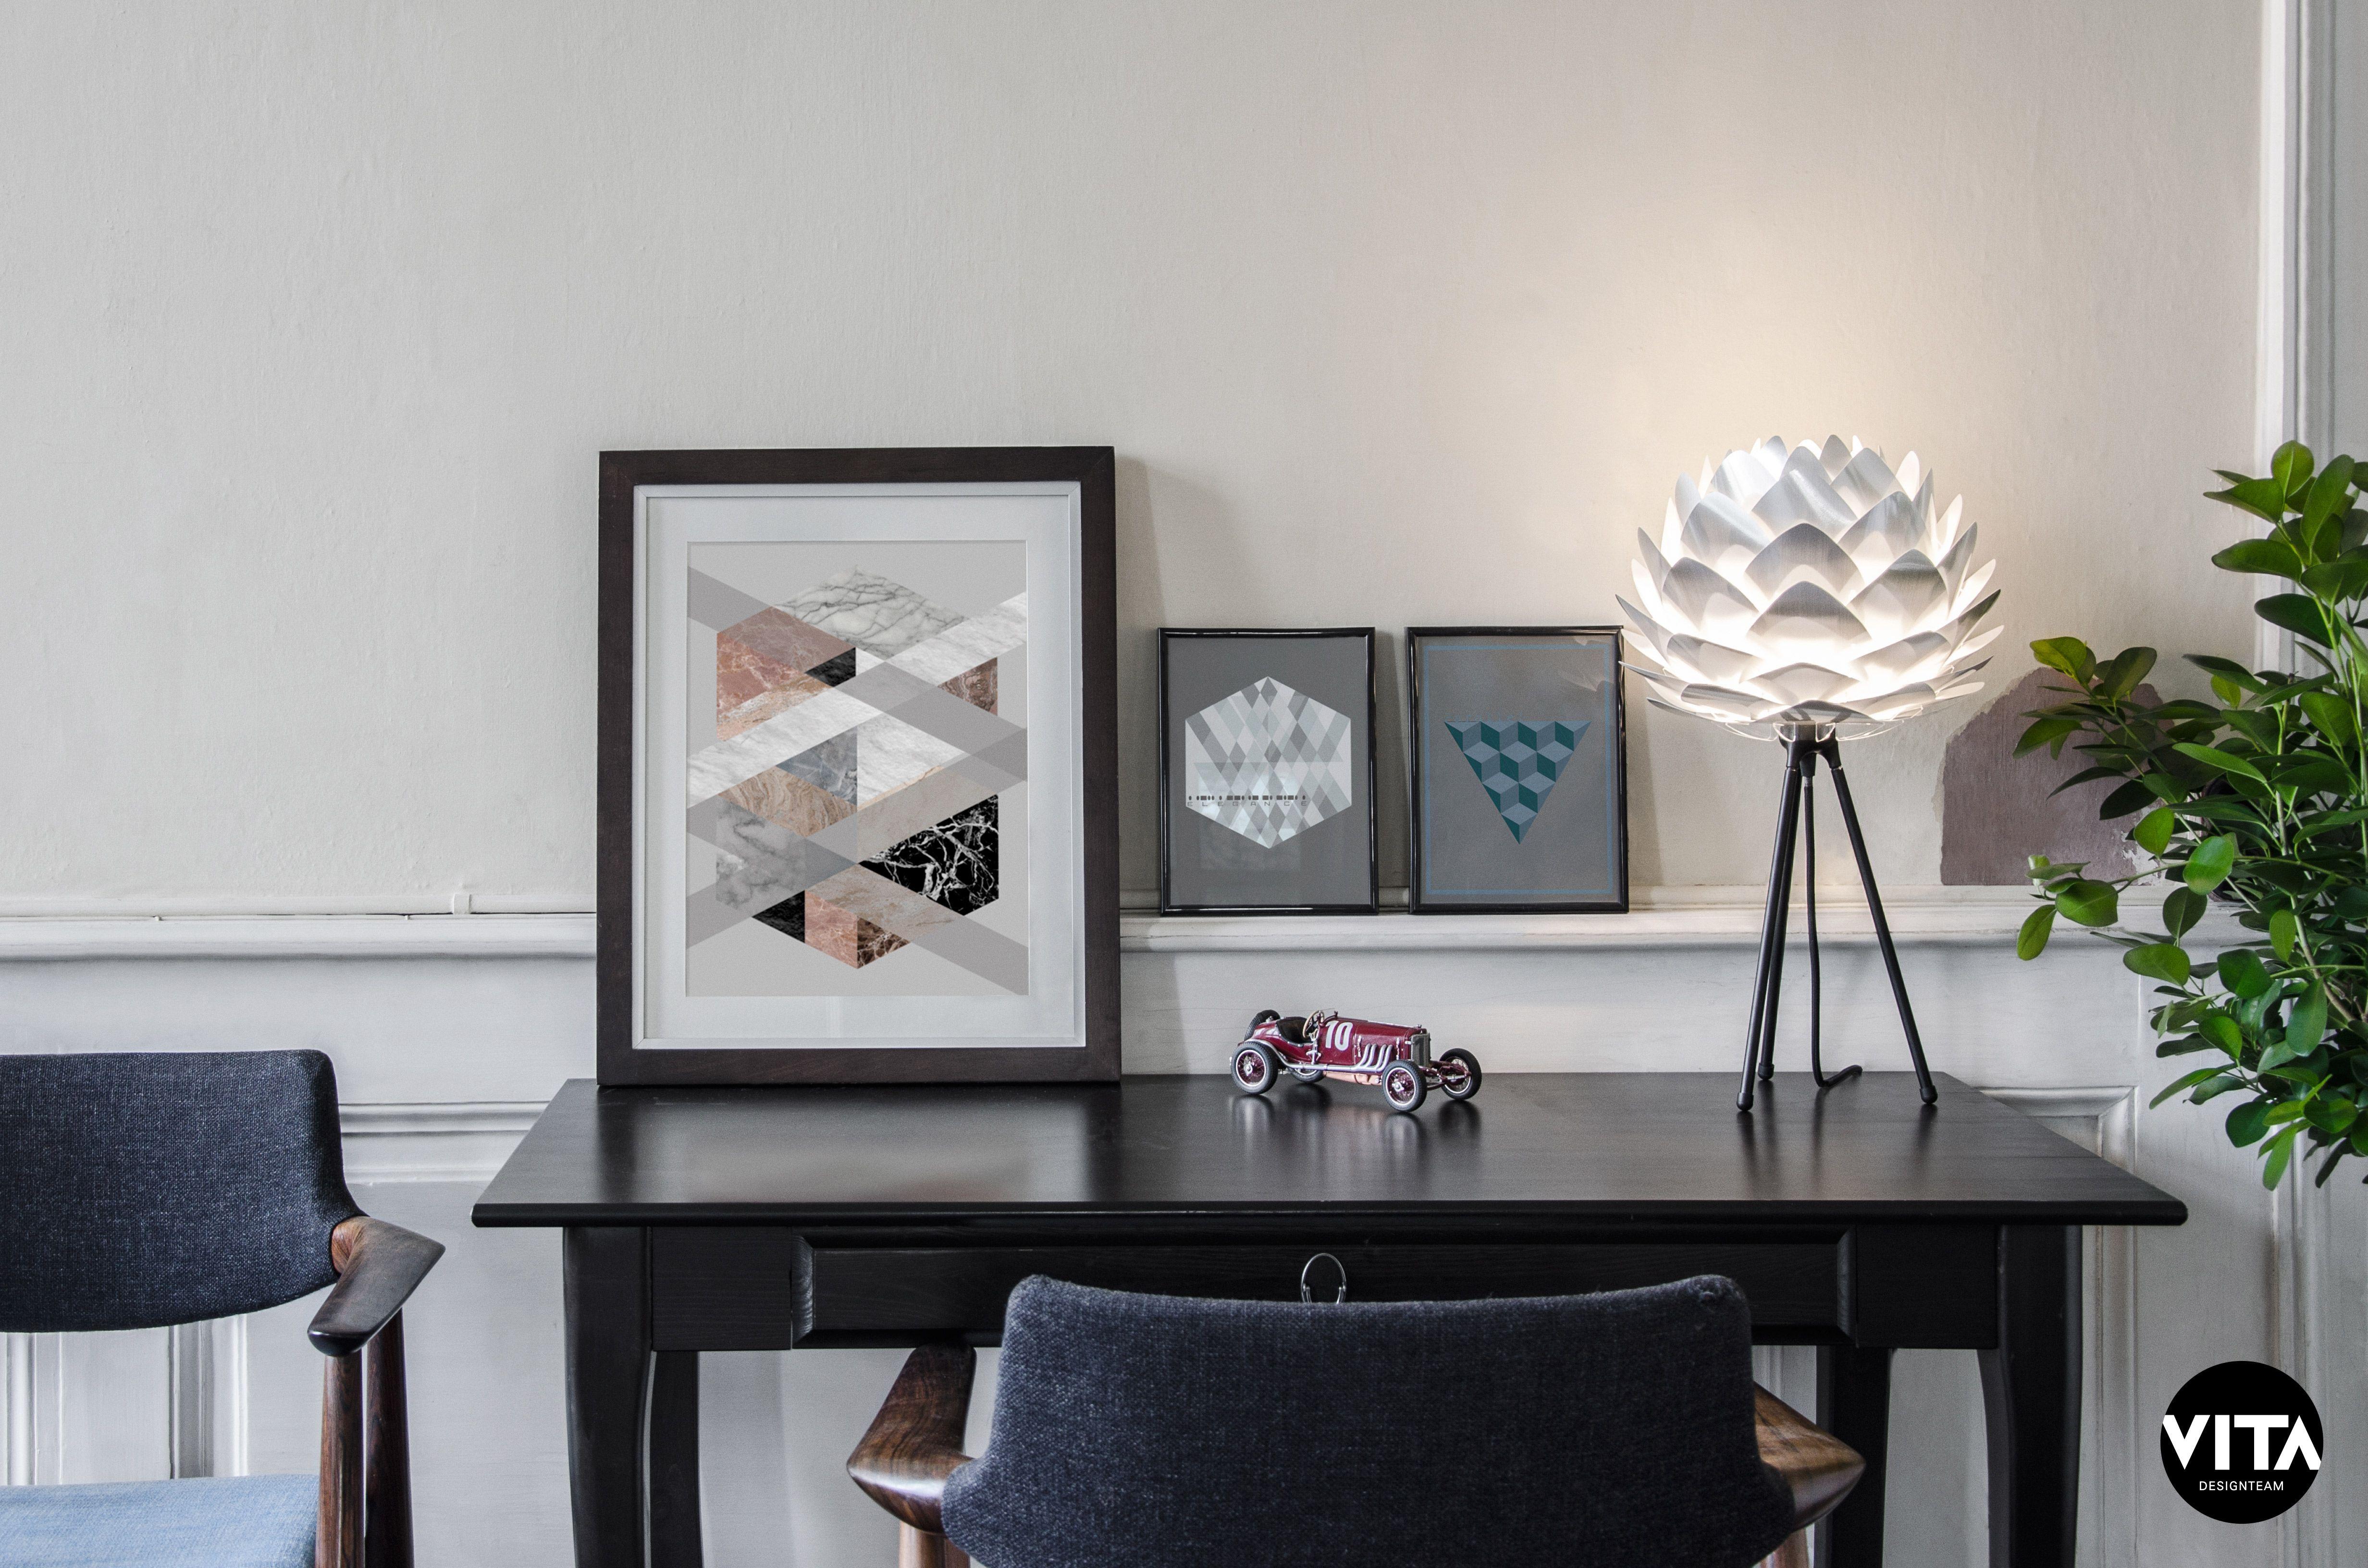 silvia mini steel vita copenhagen environment photos pinterest steel copenhagen and danish. Black Bedroom Furniture Sets. Home Design Ideas